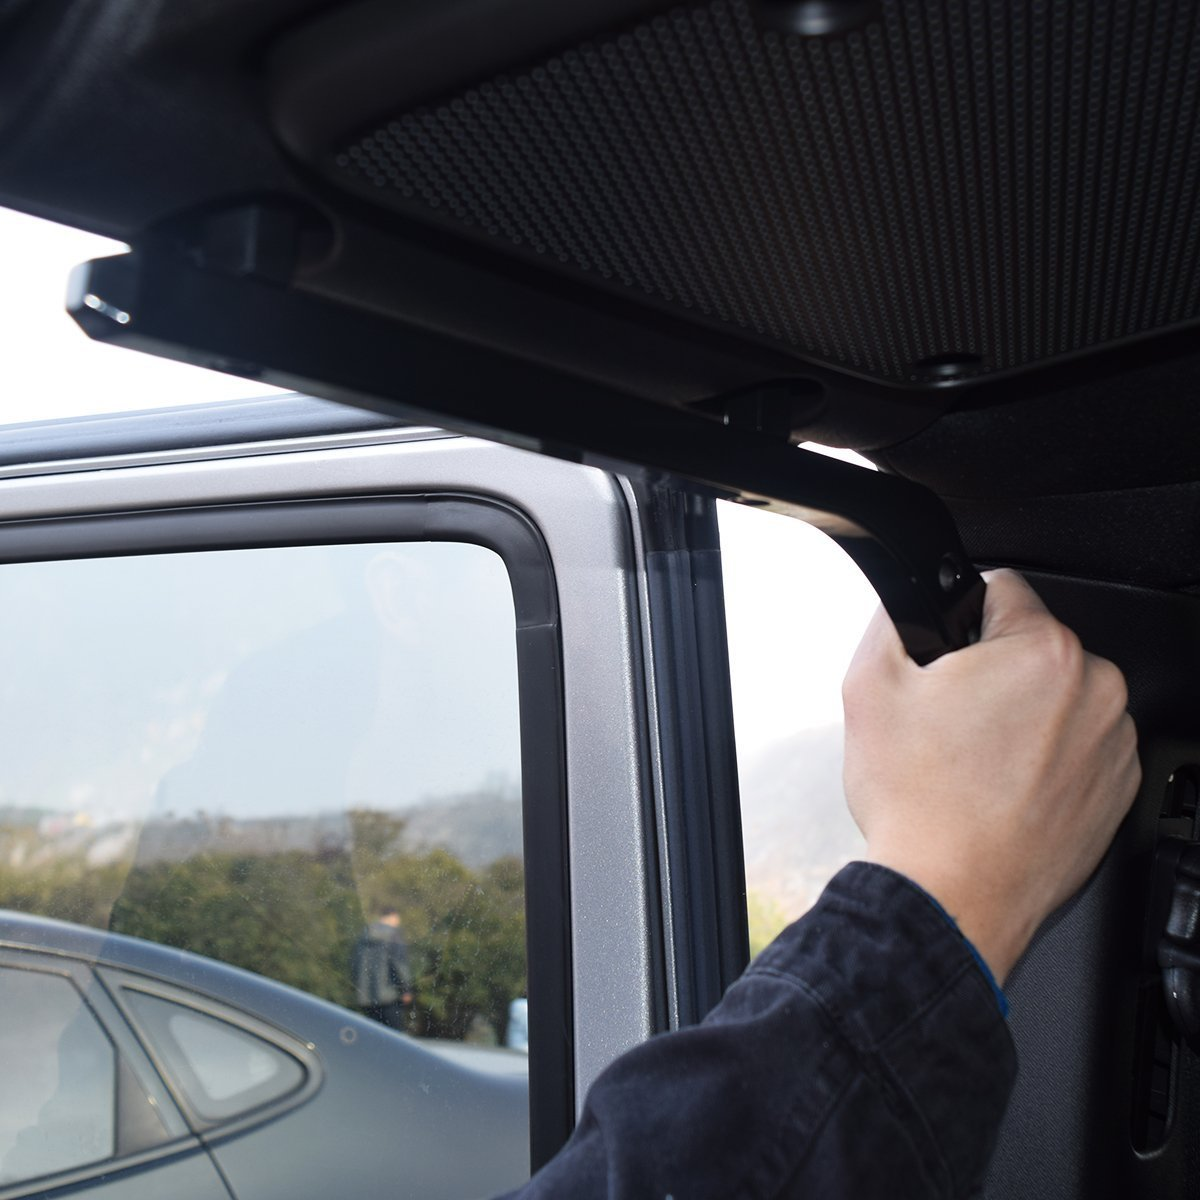 Black Pair American 4wheel Jeep Wrangler Grab Bar Grab Handles Door Handle Rear Grab Handle Jeep Wrangler Accessories JK JKU /& Unlimited Rubicon Sahara Sports,2007-2018,New Aluminum